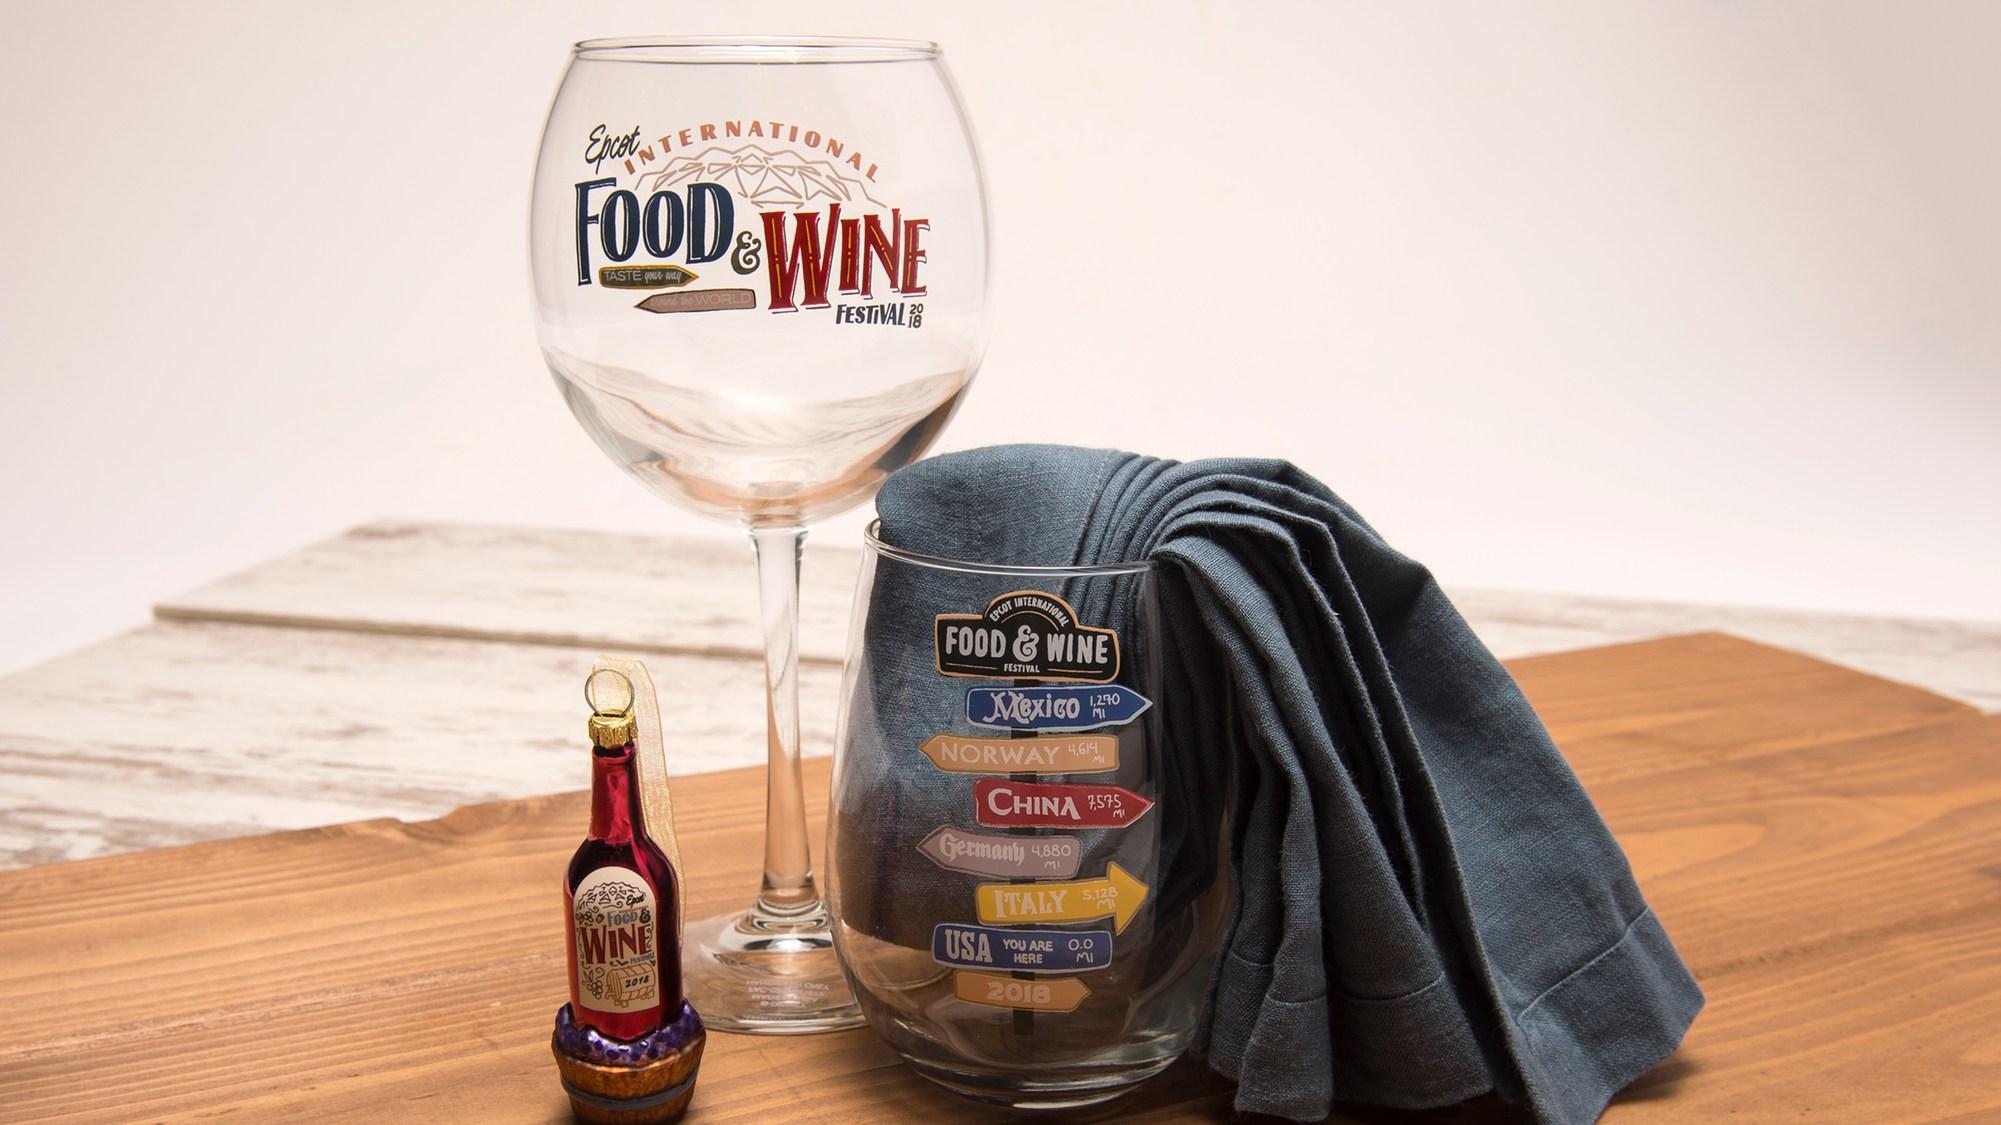 food-wine-merch-sneak-peek-2018-1.jpg